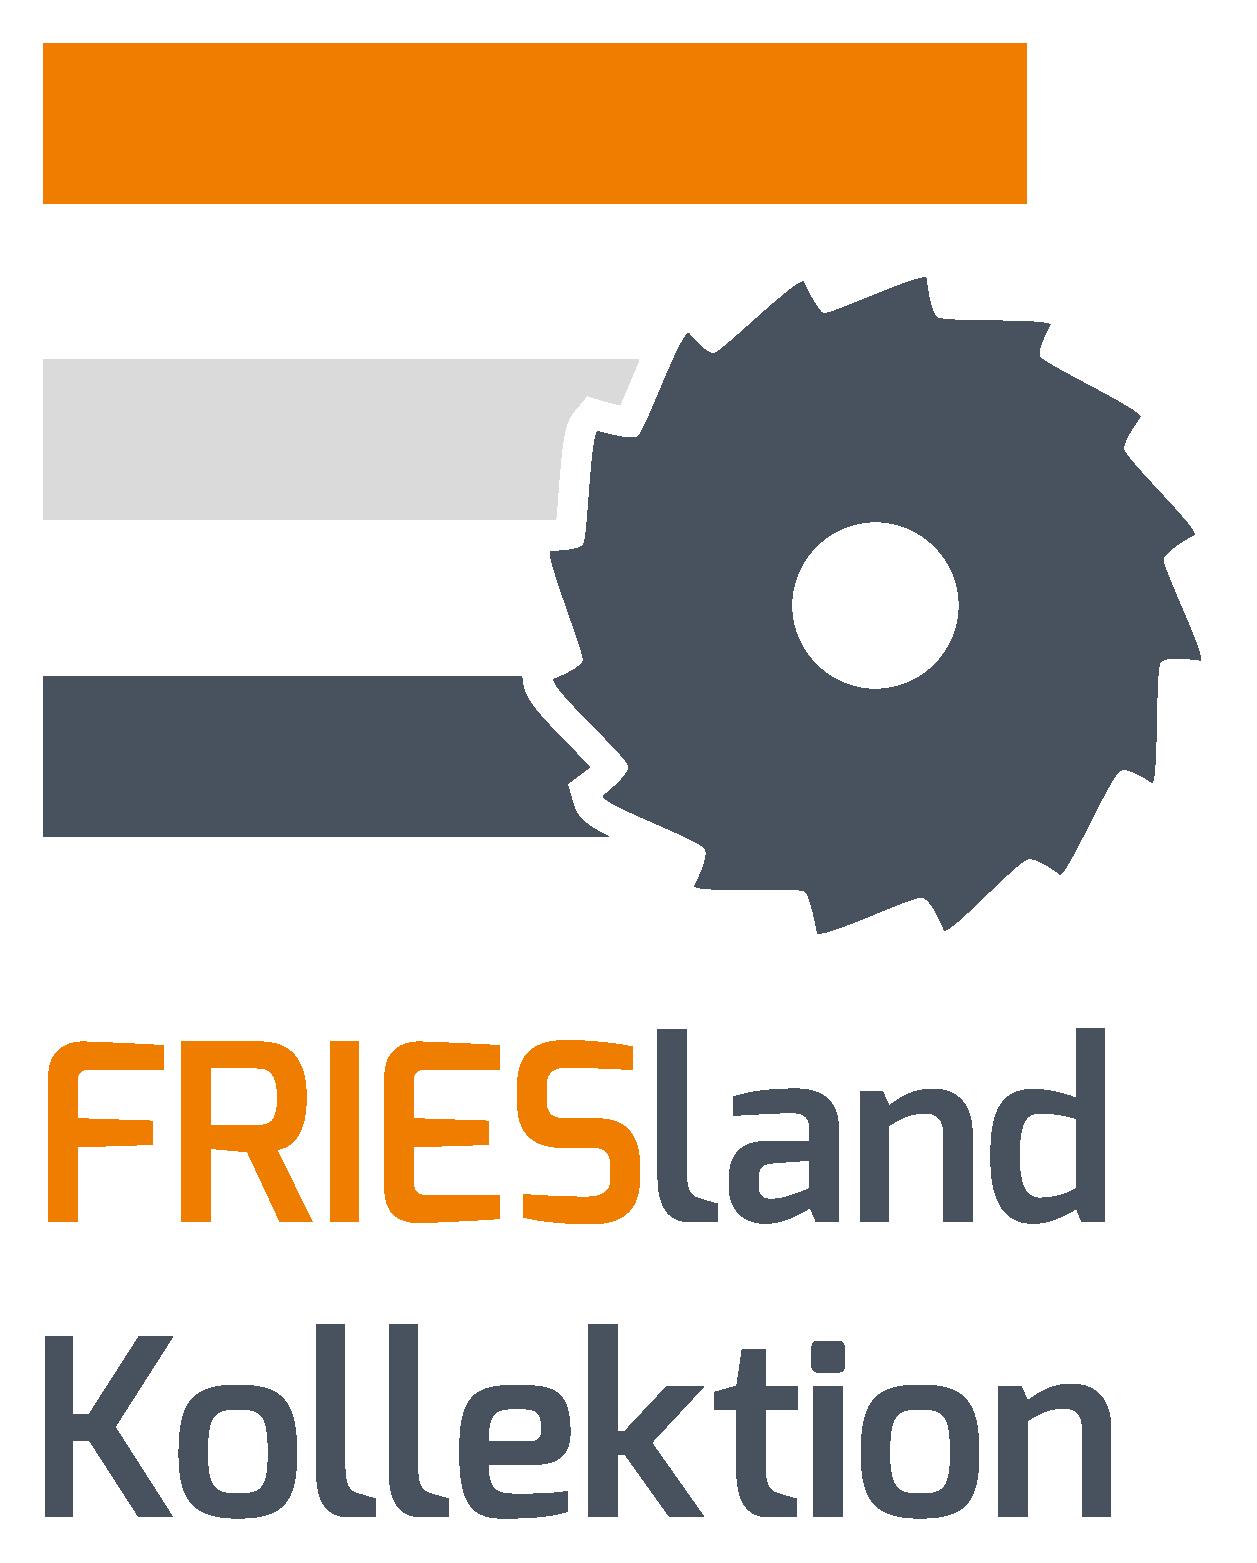 FRIESland Kollektion